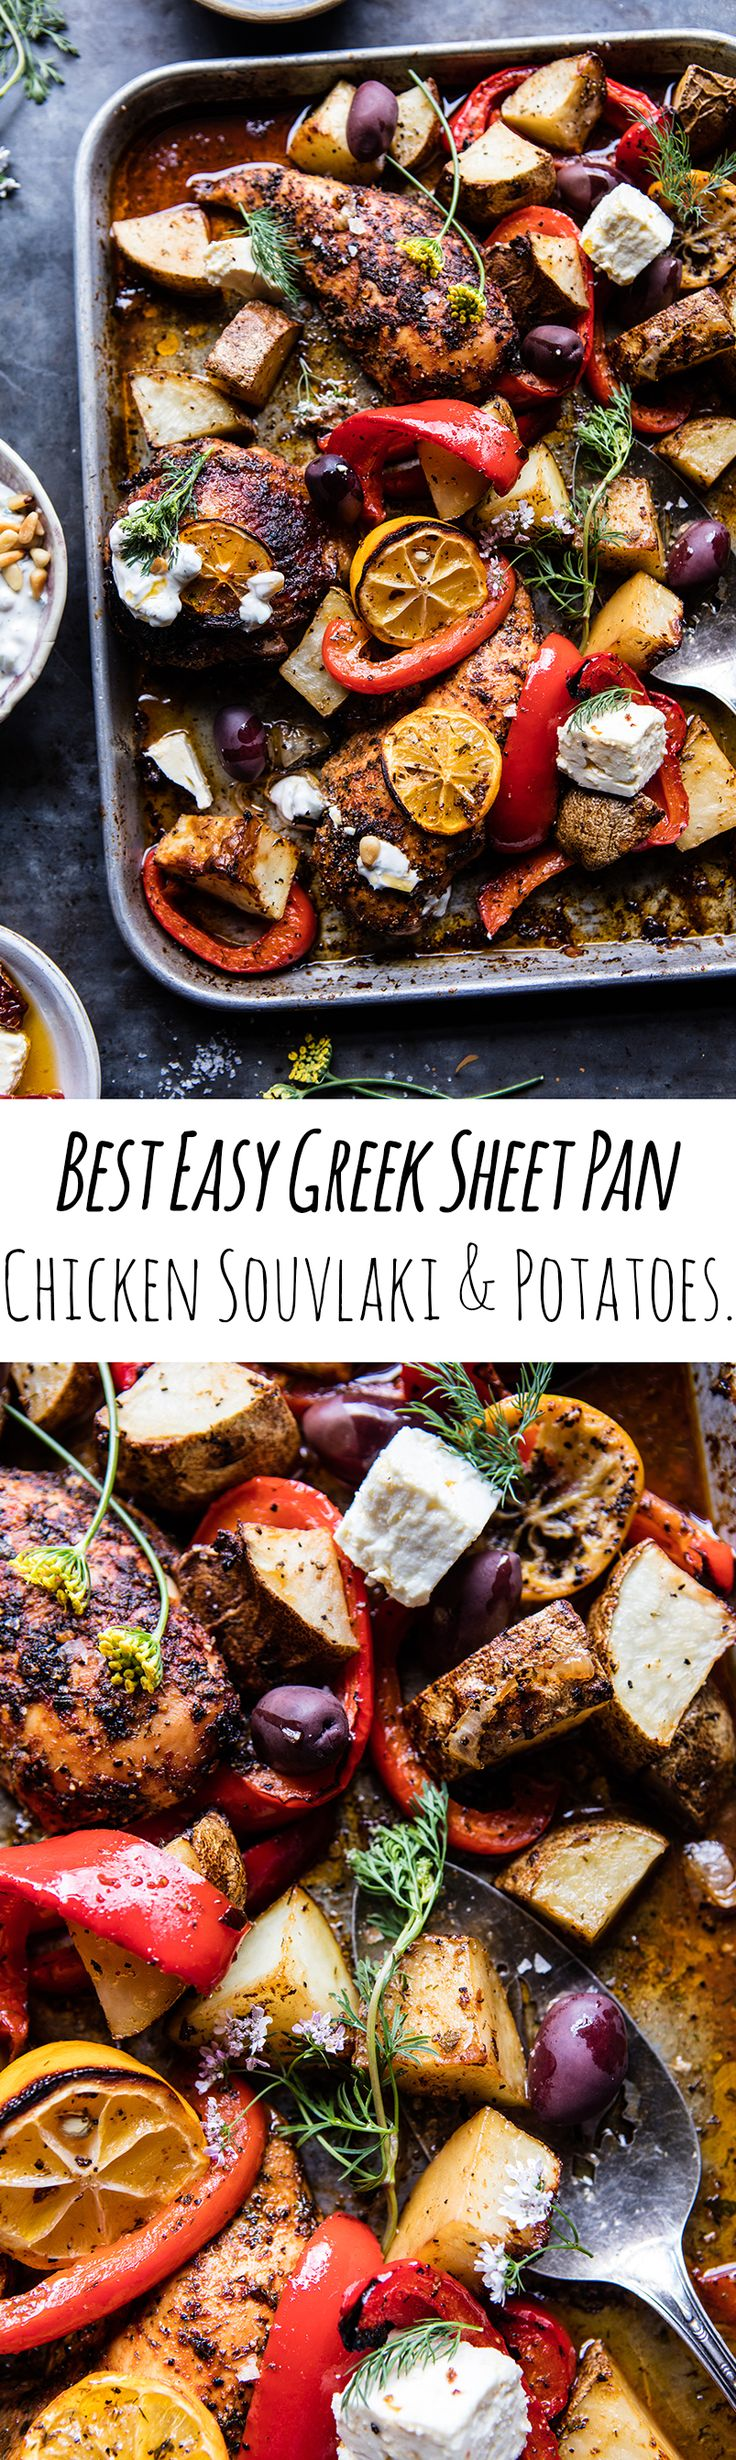 Best Easy Greek Sheet Pan Chicken Souvlaki and Potatoes | halfbakedharvest.com @hbharvest